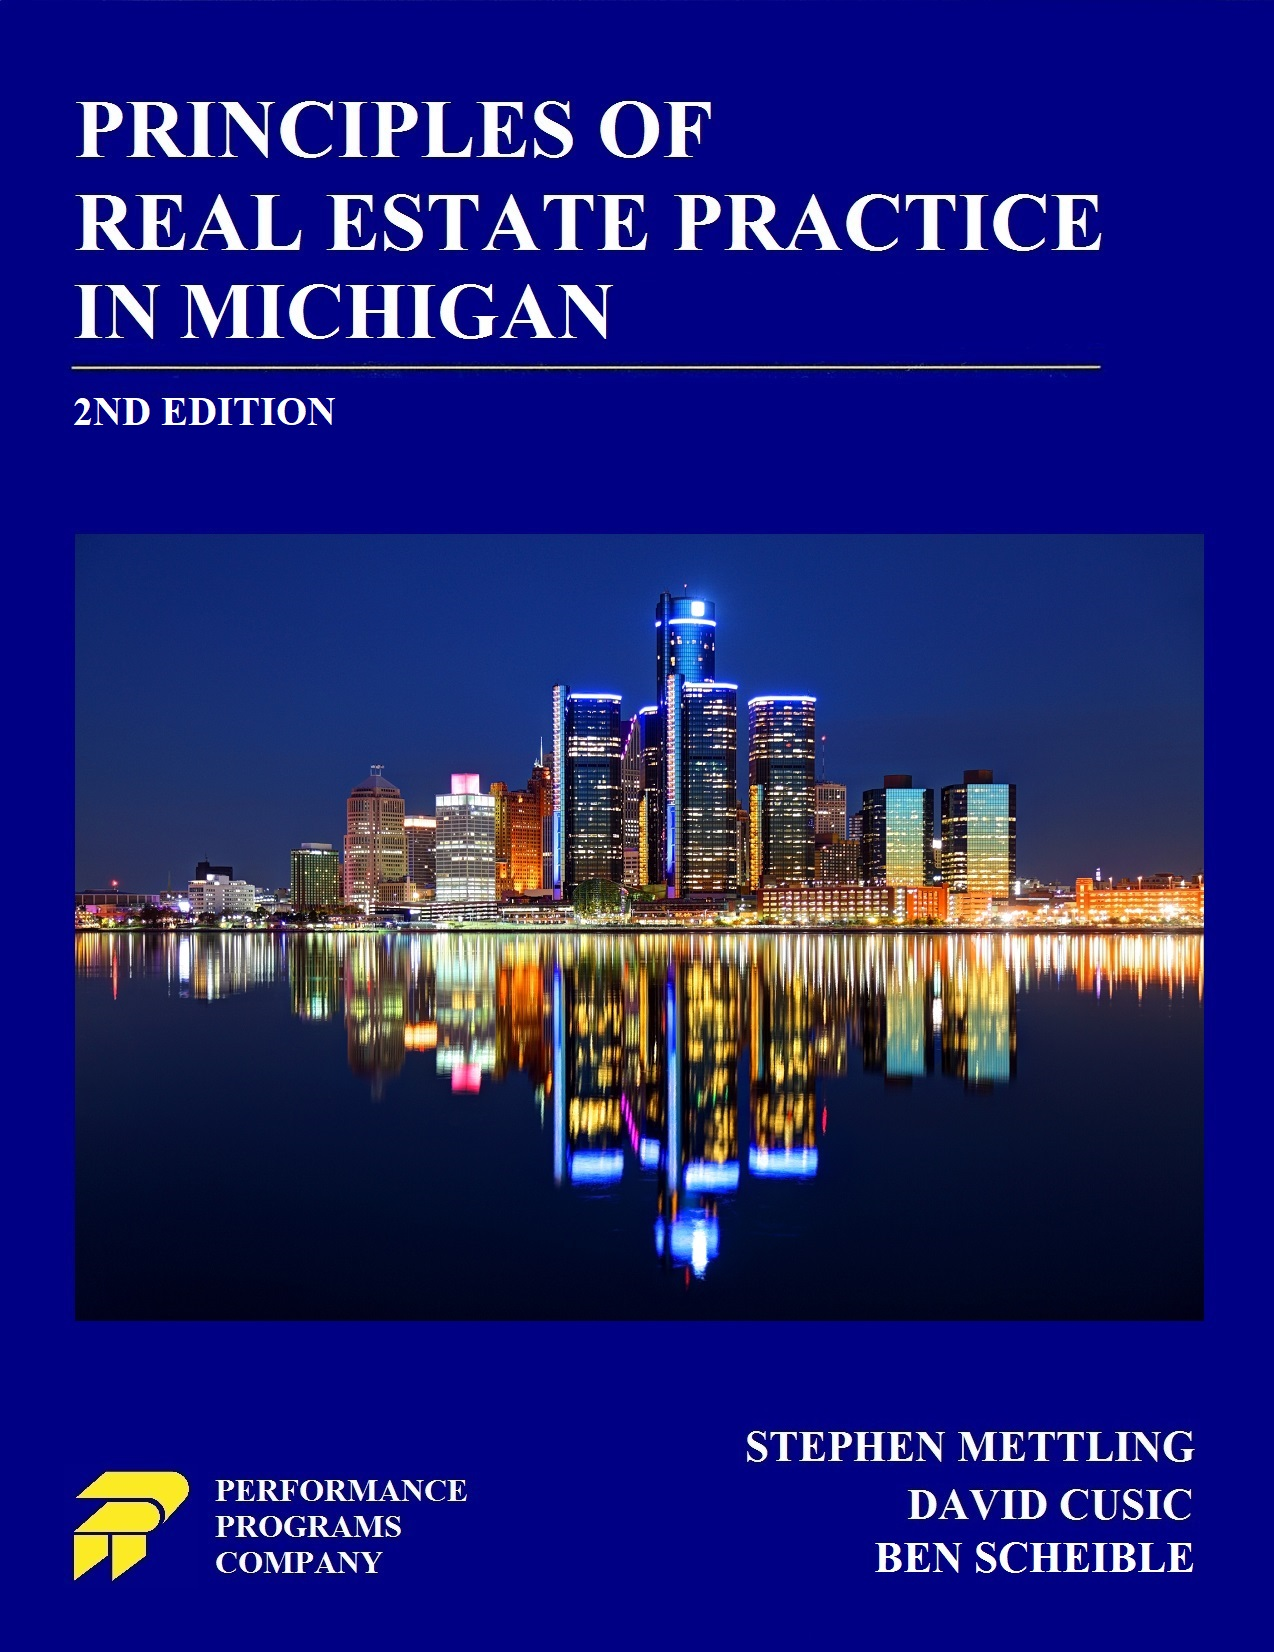 PREP-MI Principles of Real Estate Practice 2nd Ed Book Cover 7-9-2020